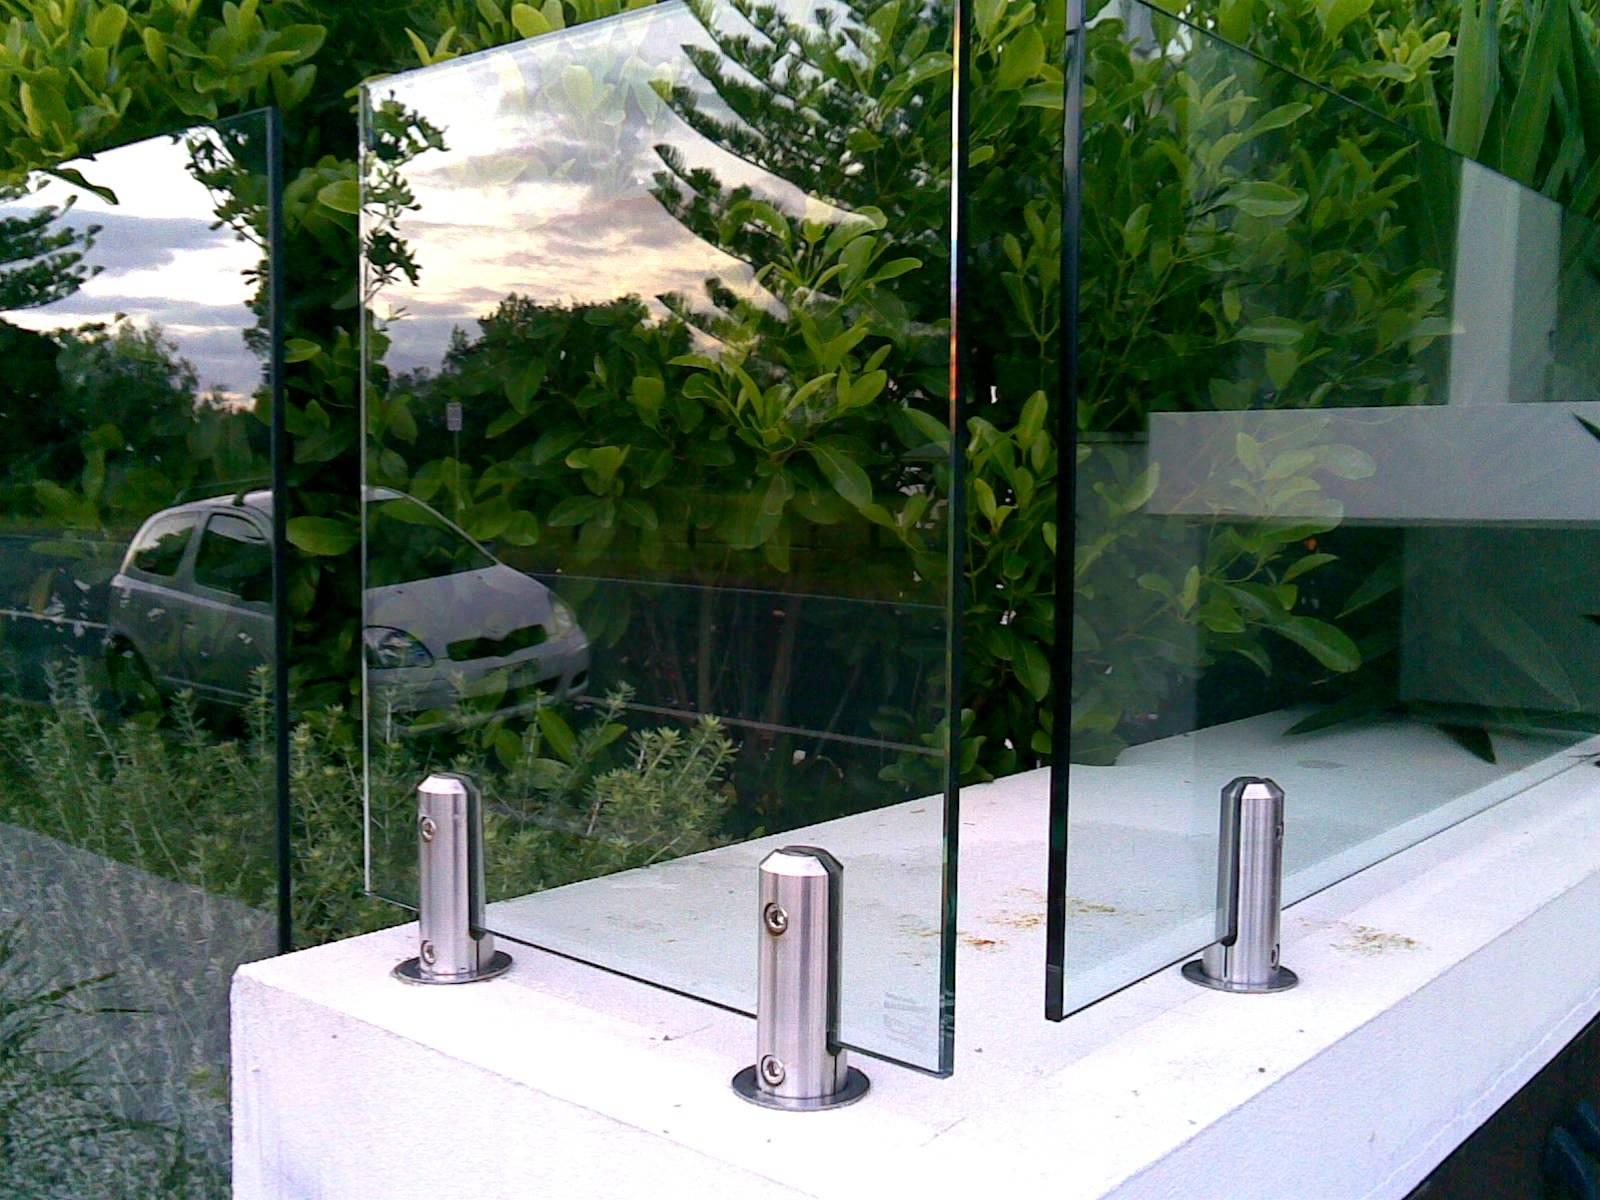 FRAMELESS GLASS Stainless Steel Spigots